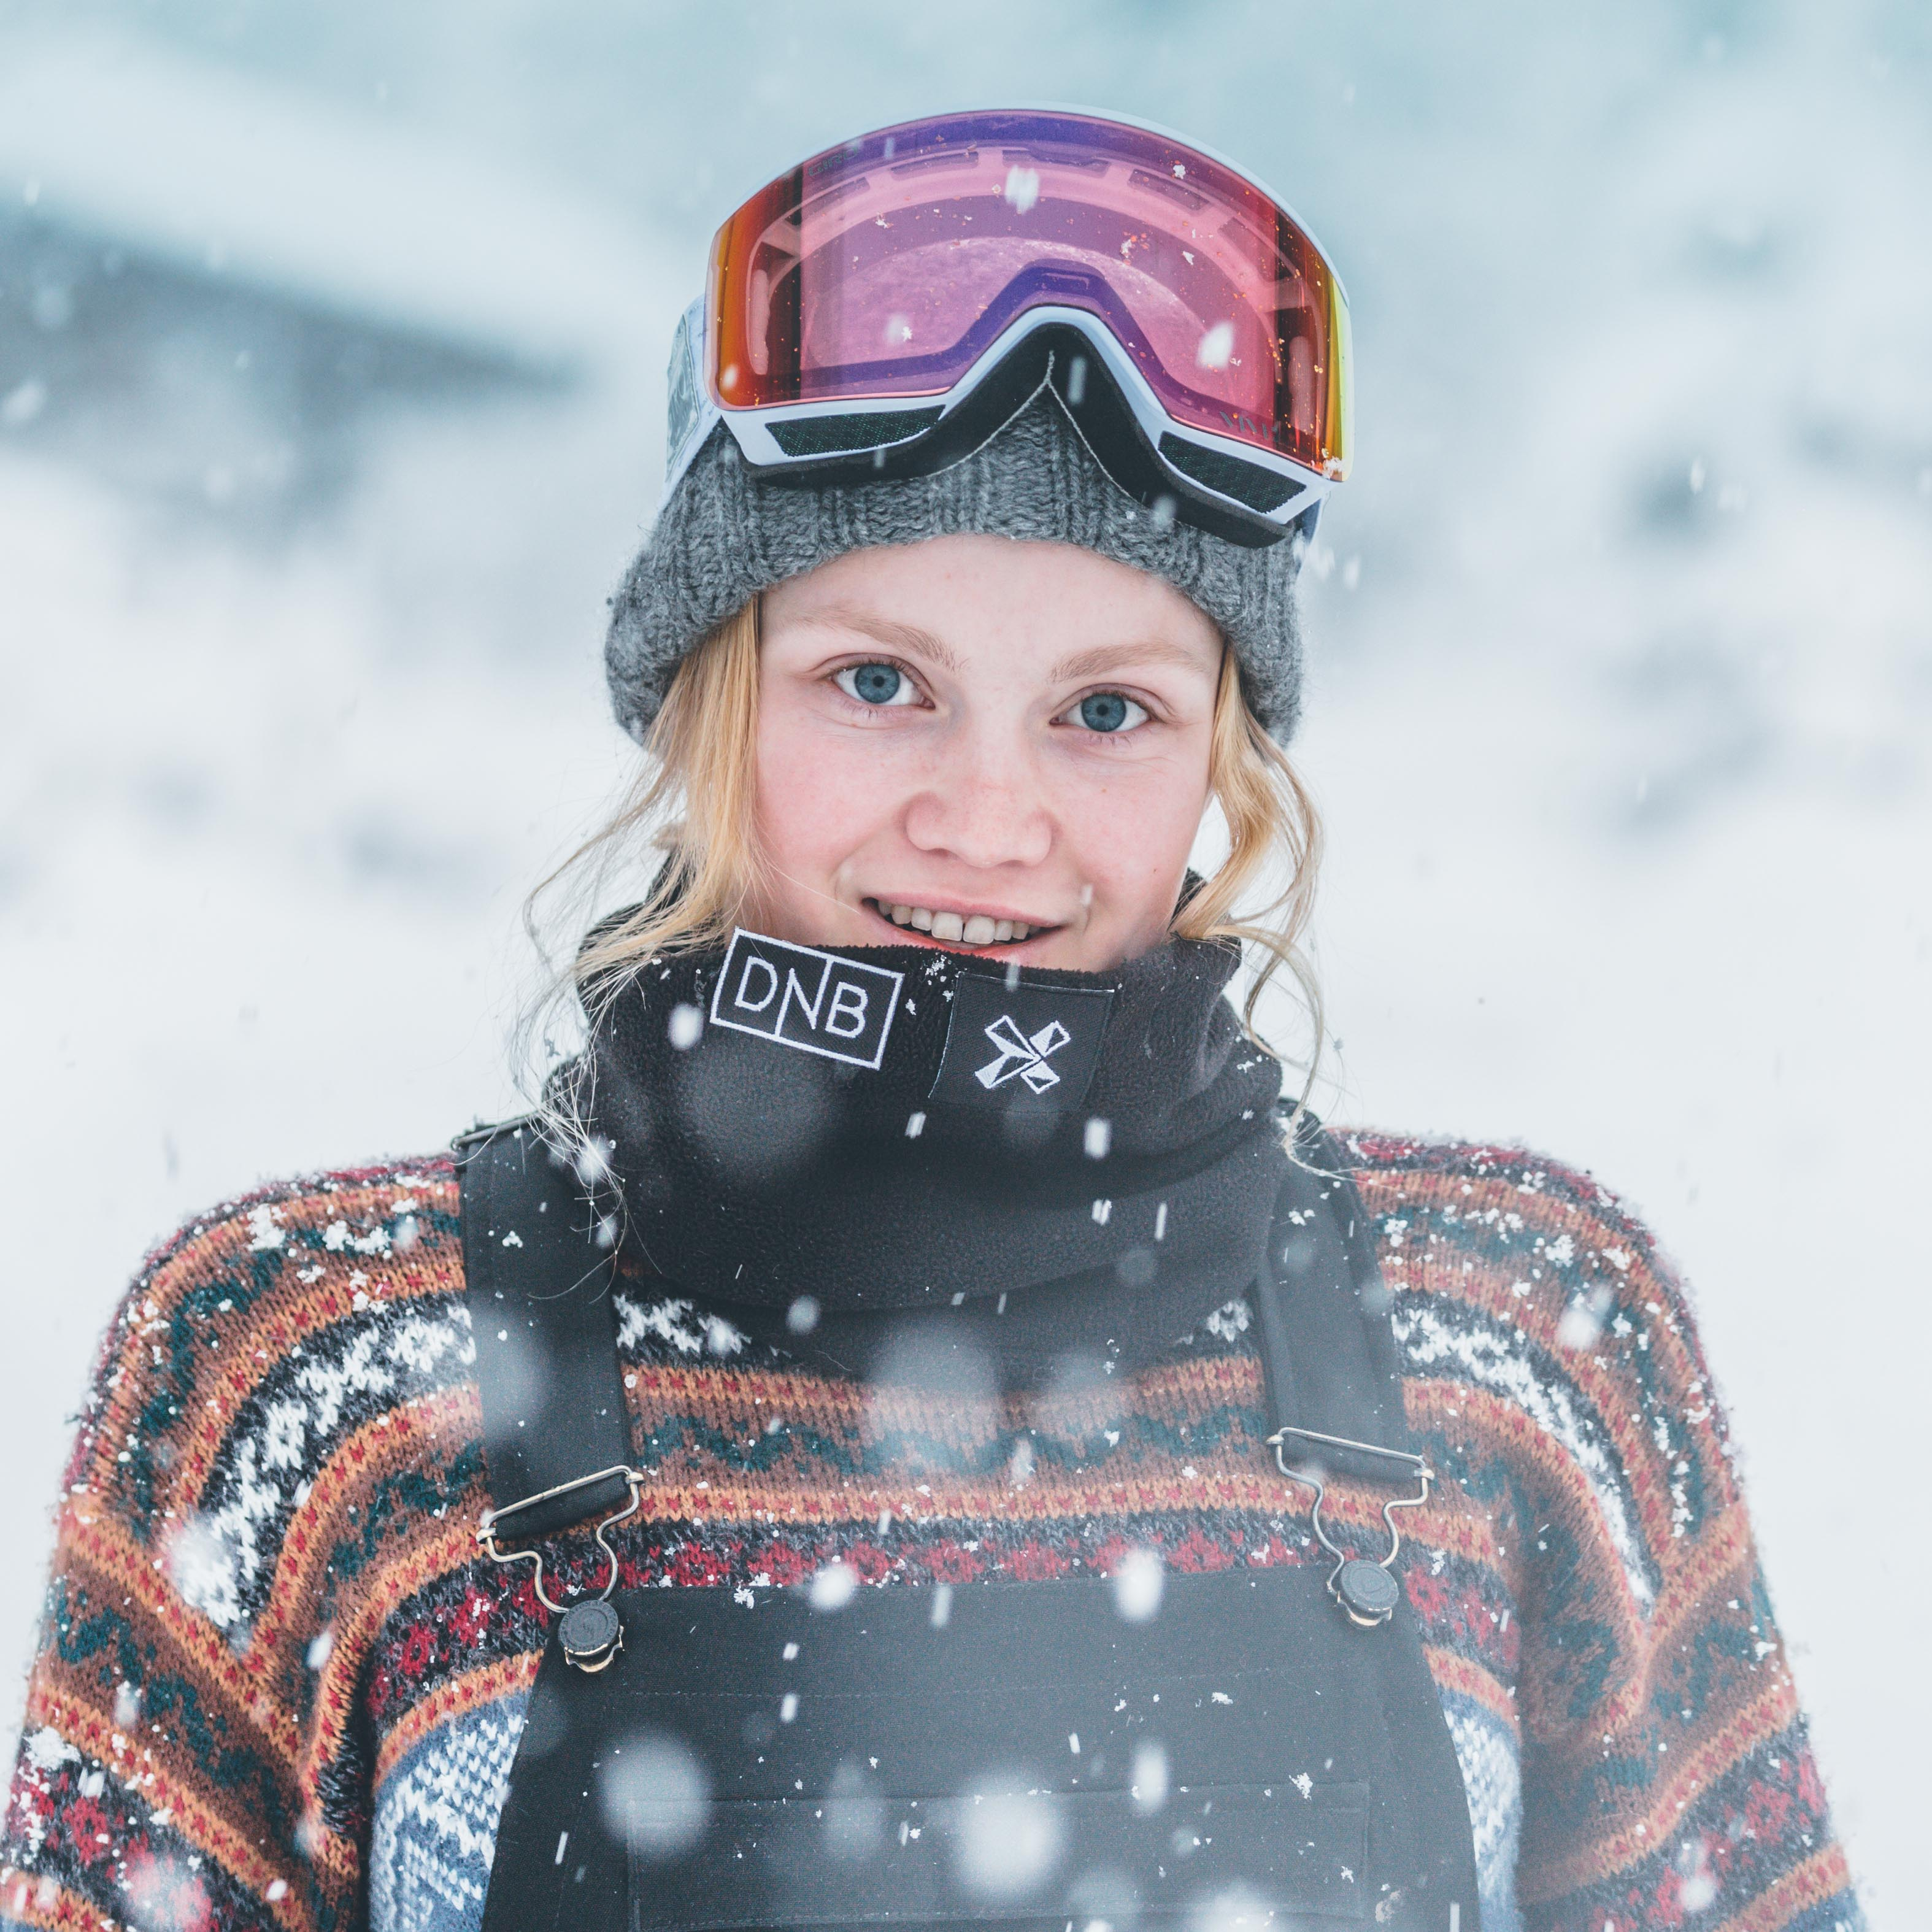 Tina Steffensen